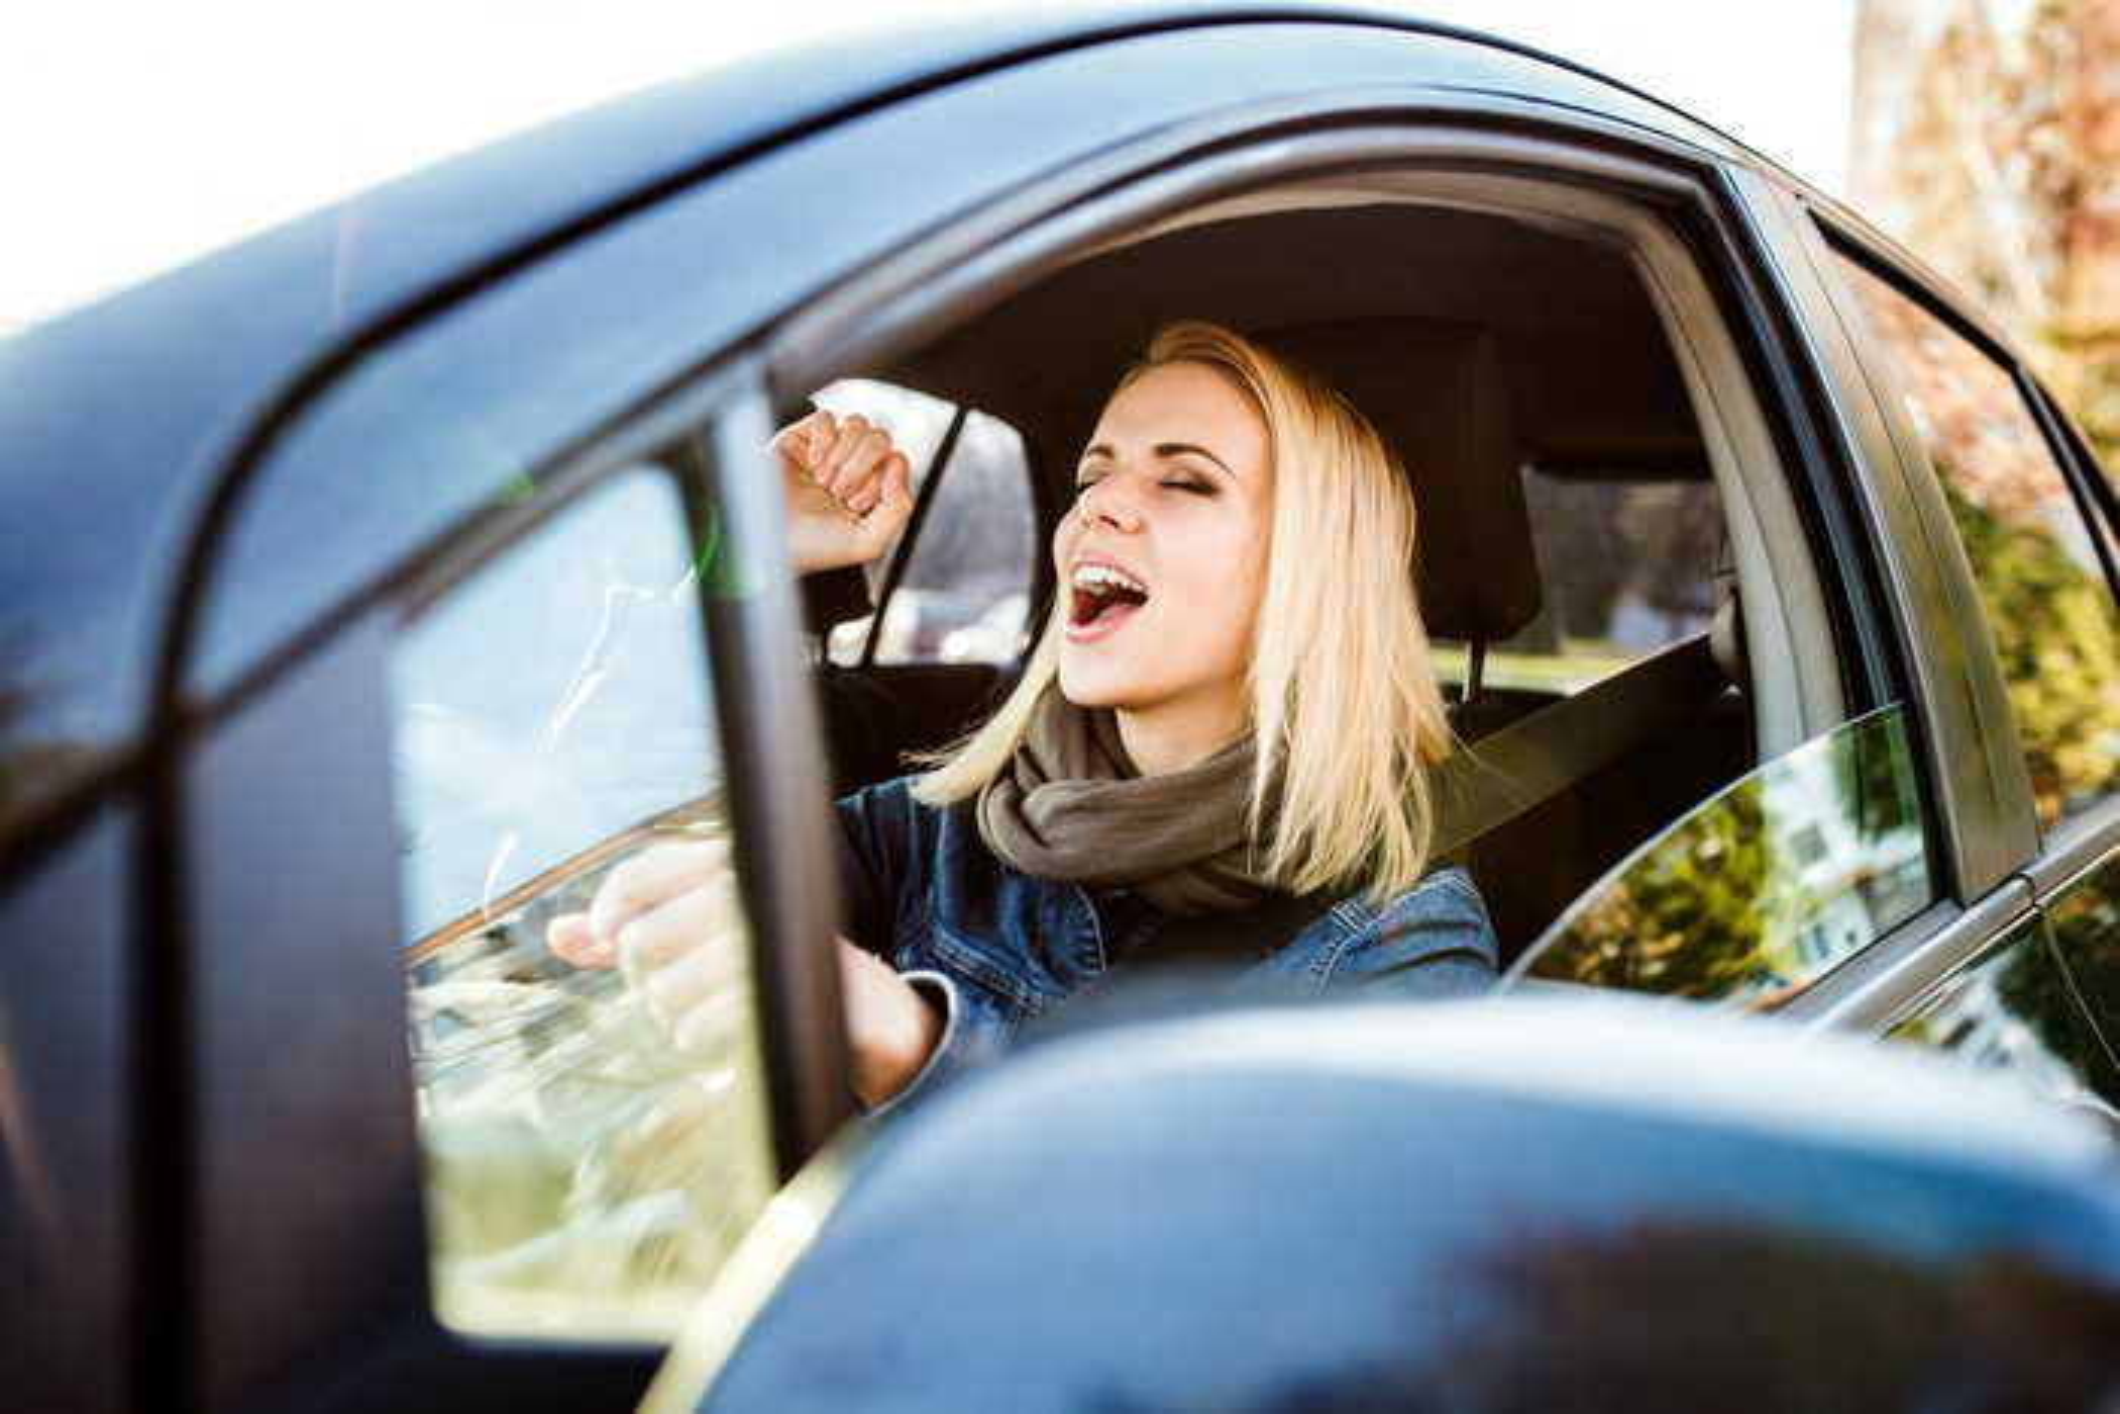 Woman singing in a car